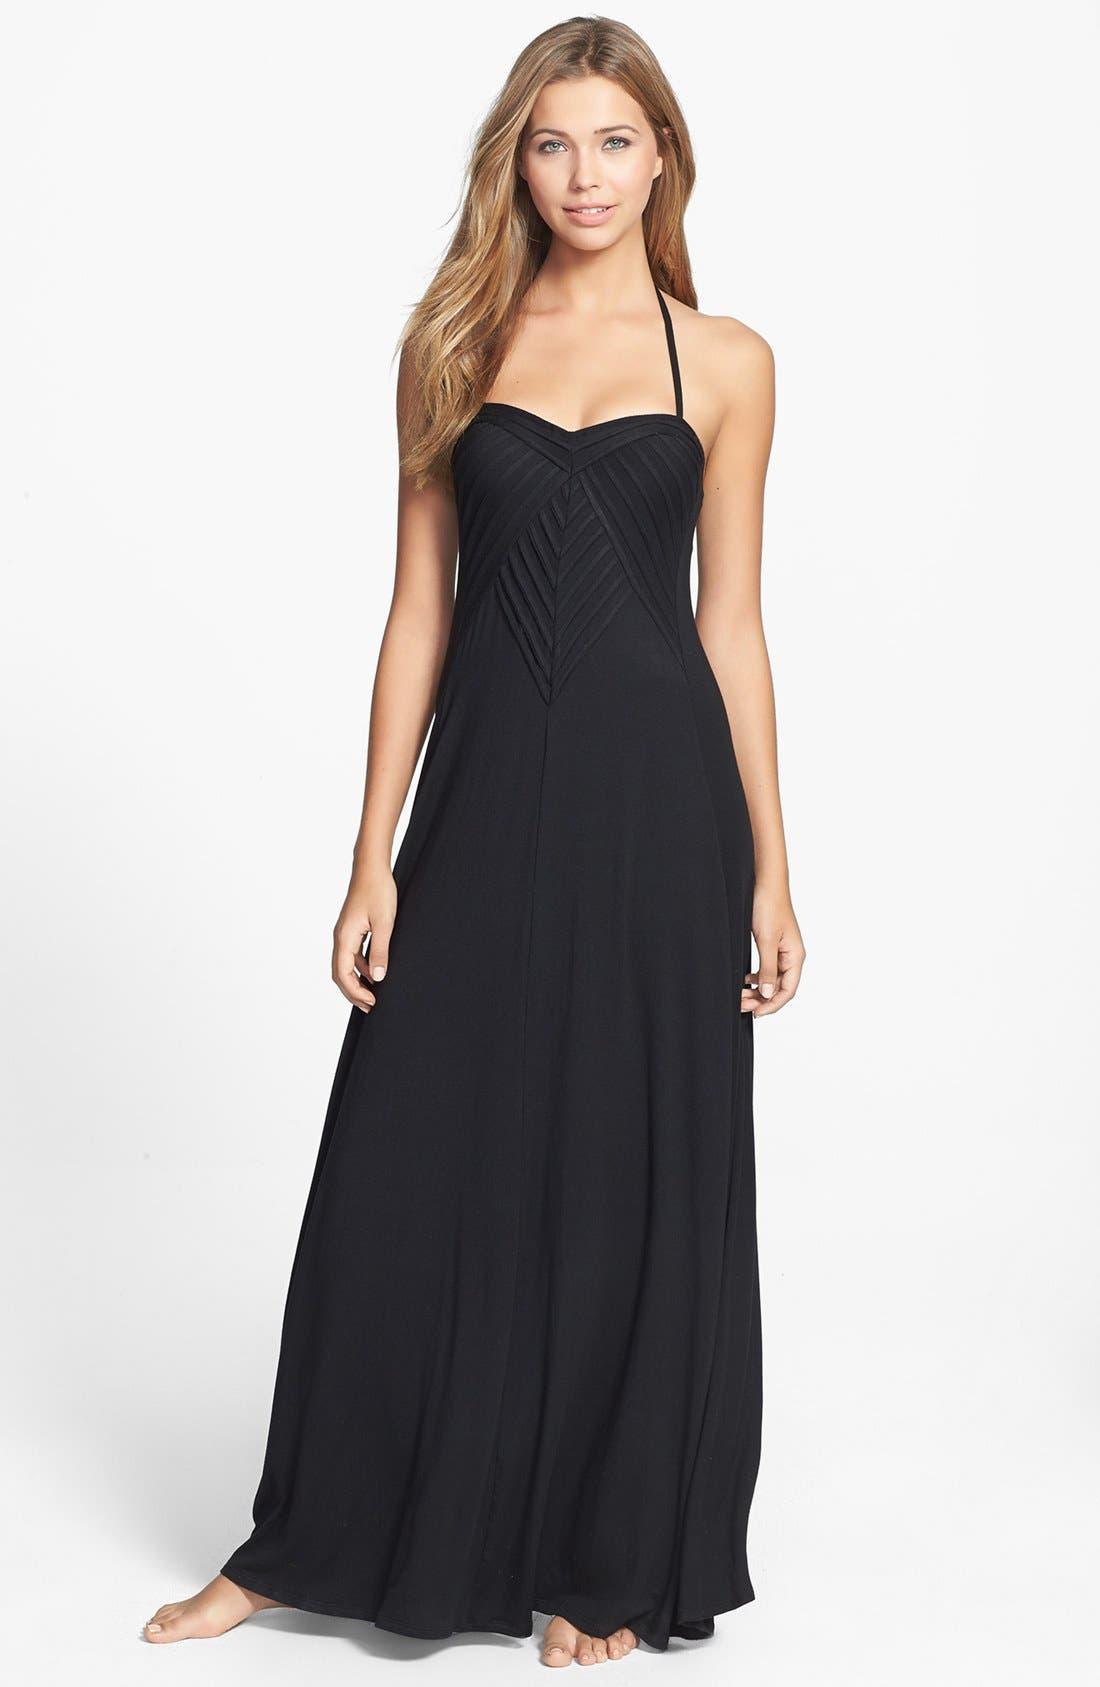 Main Image - Robin Piccone 'Karina' Pleat Cover-Up Maxi Dress